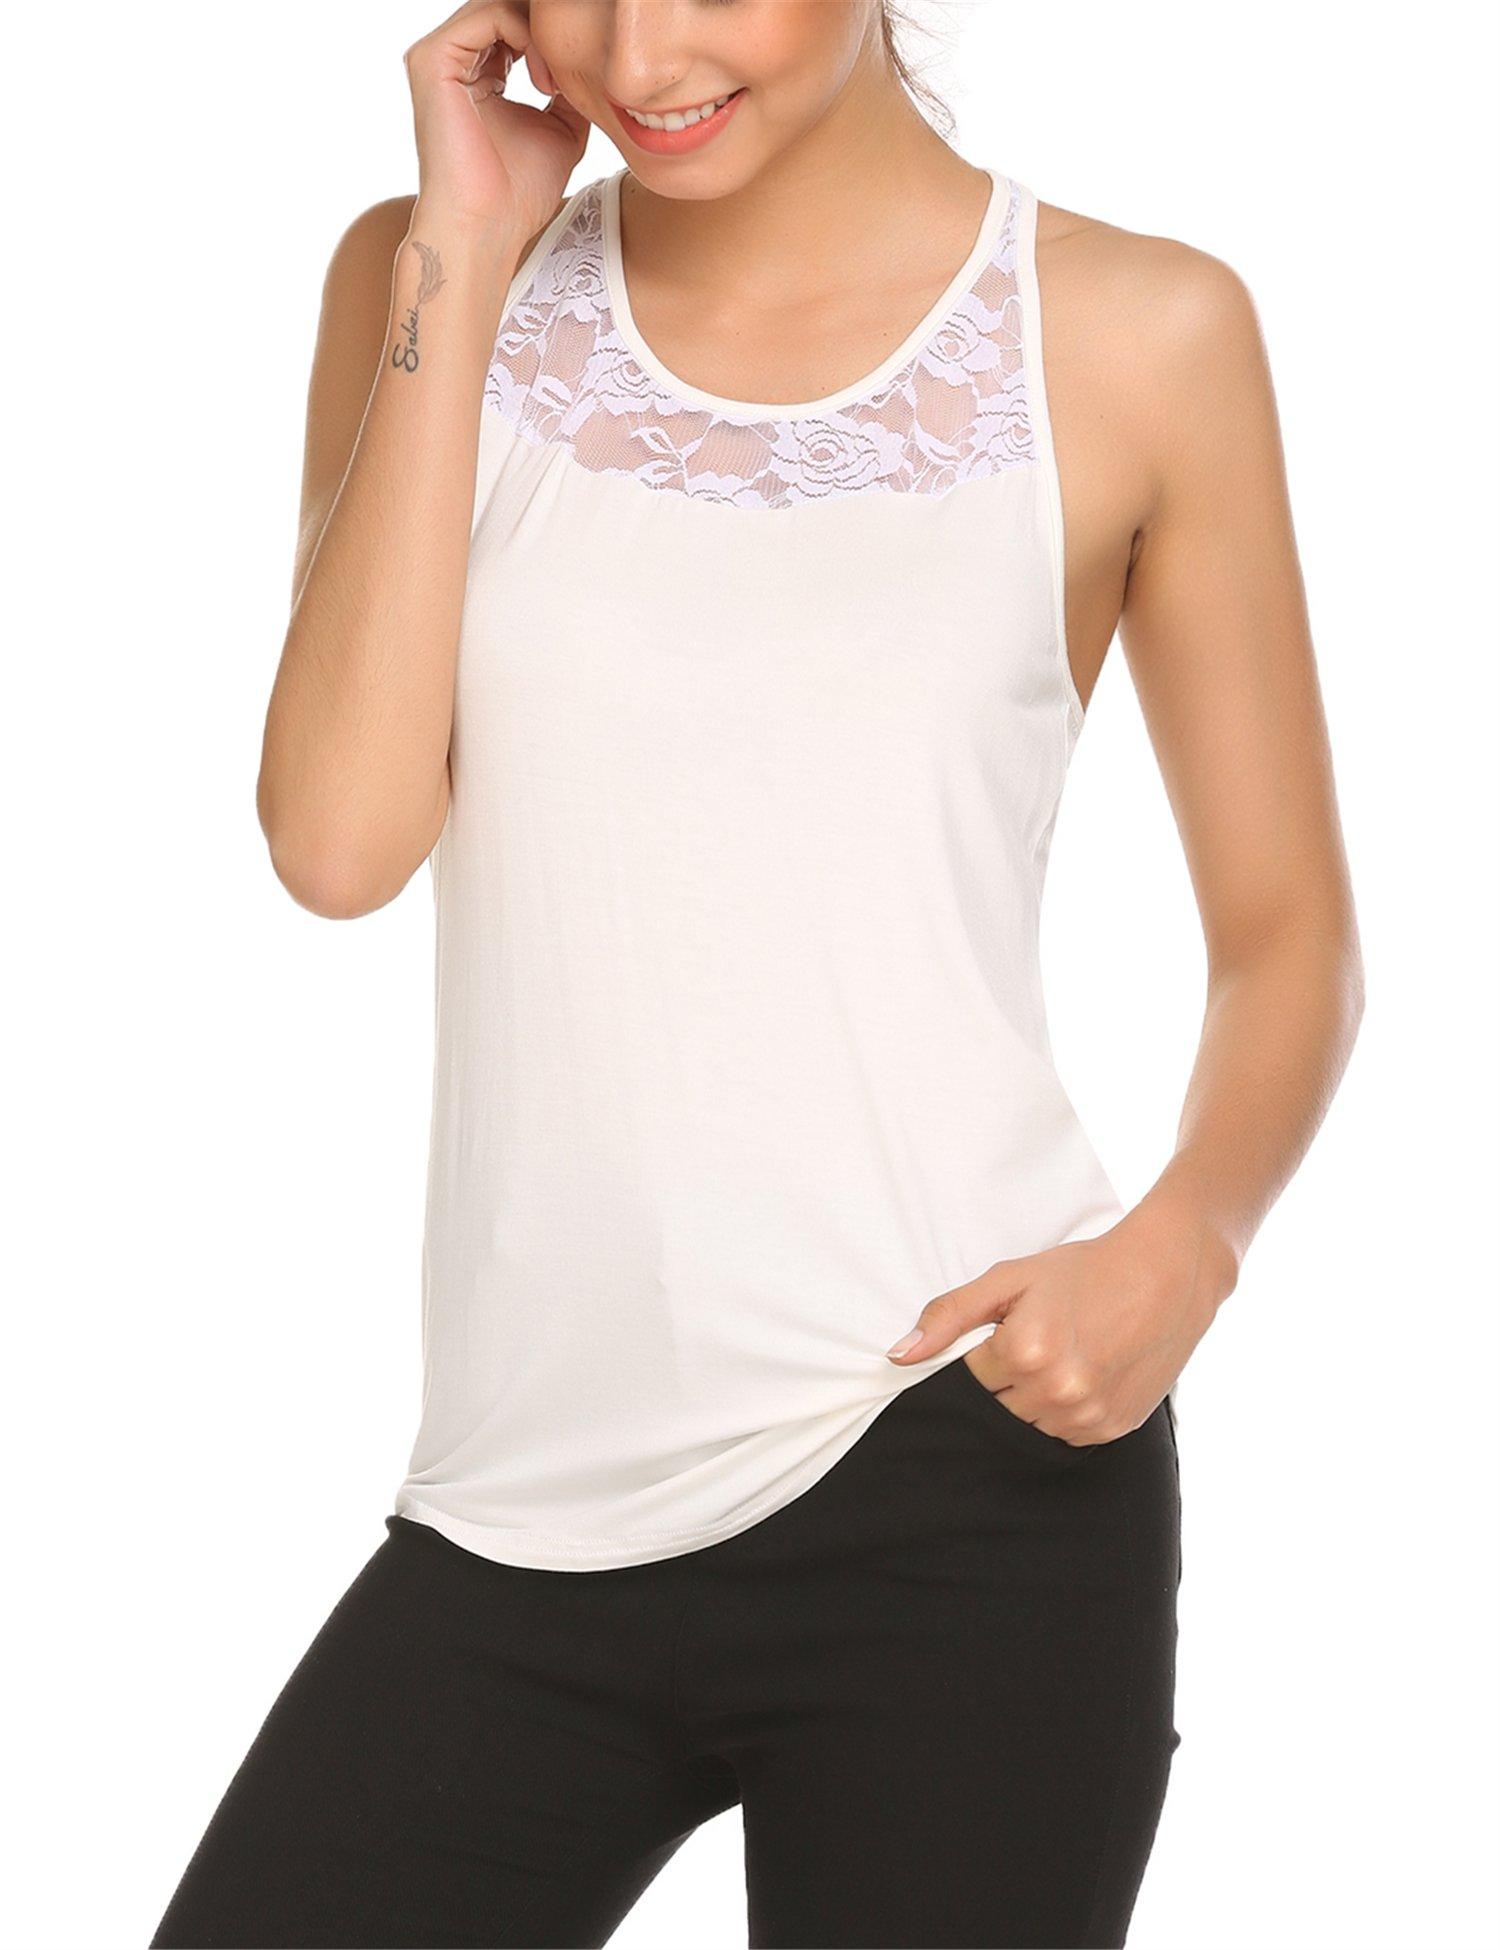 Mofavor Women's Sleeveless Crochet Lace Camisole Vest Halter Racerback Tank Top,White,Large by Mofavor (Image #3)